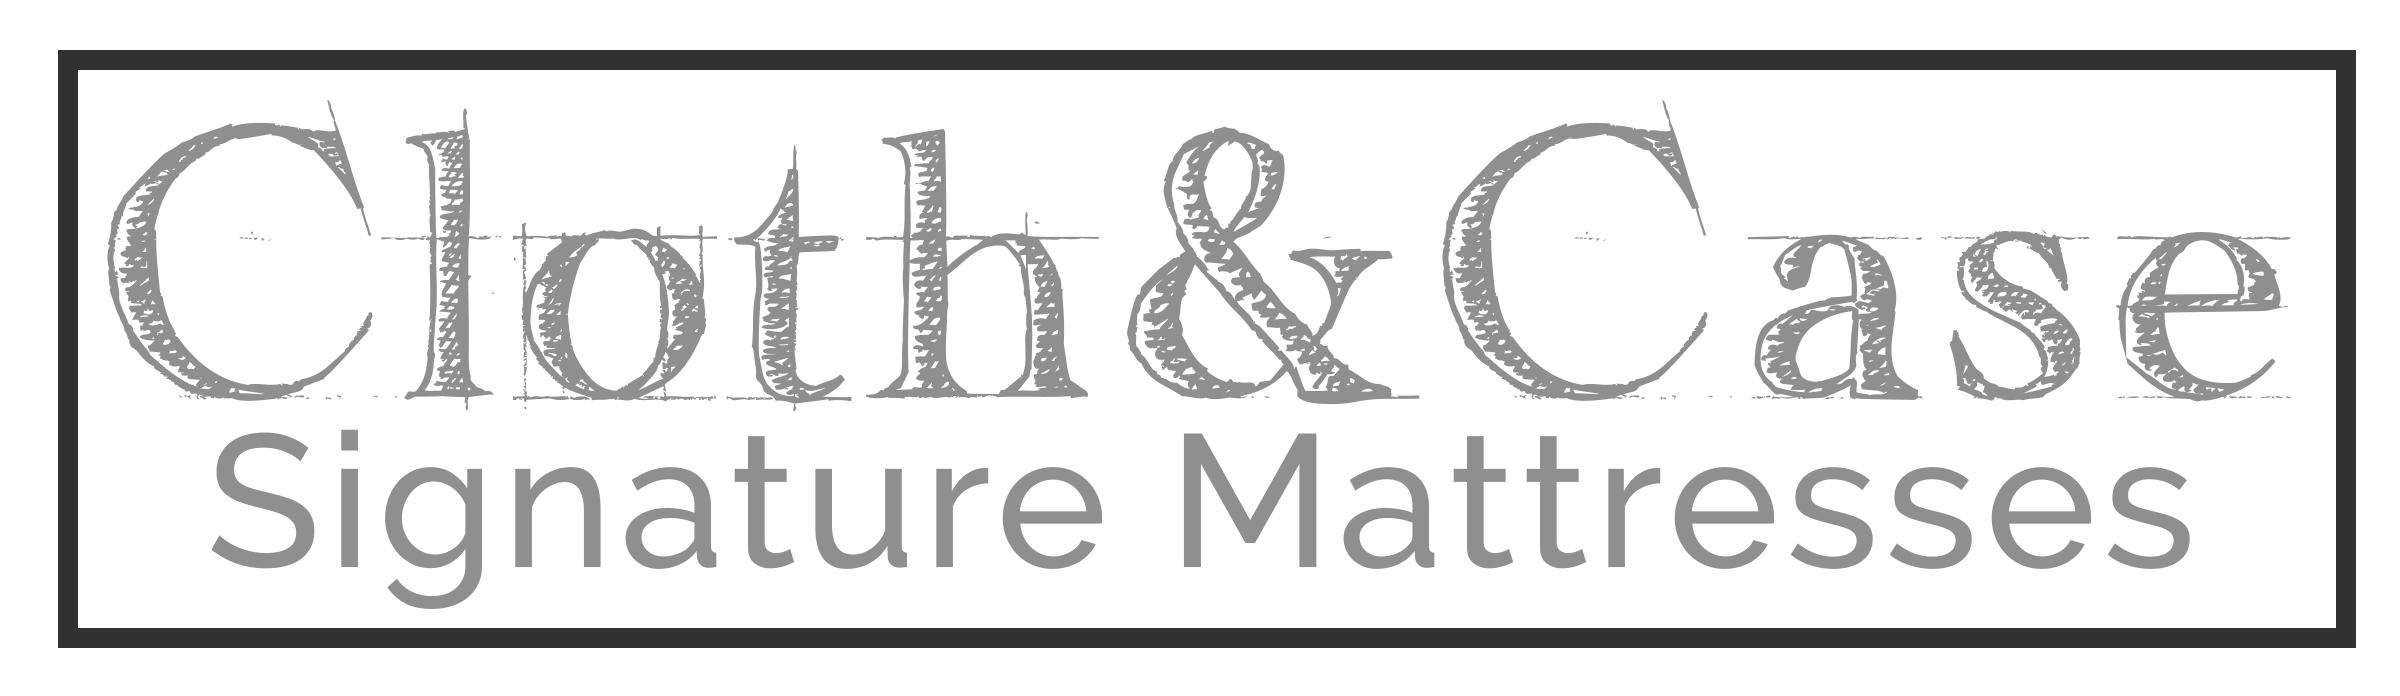 Signature Mattress Logo